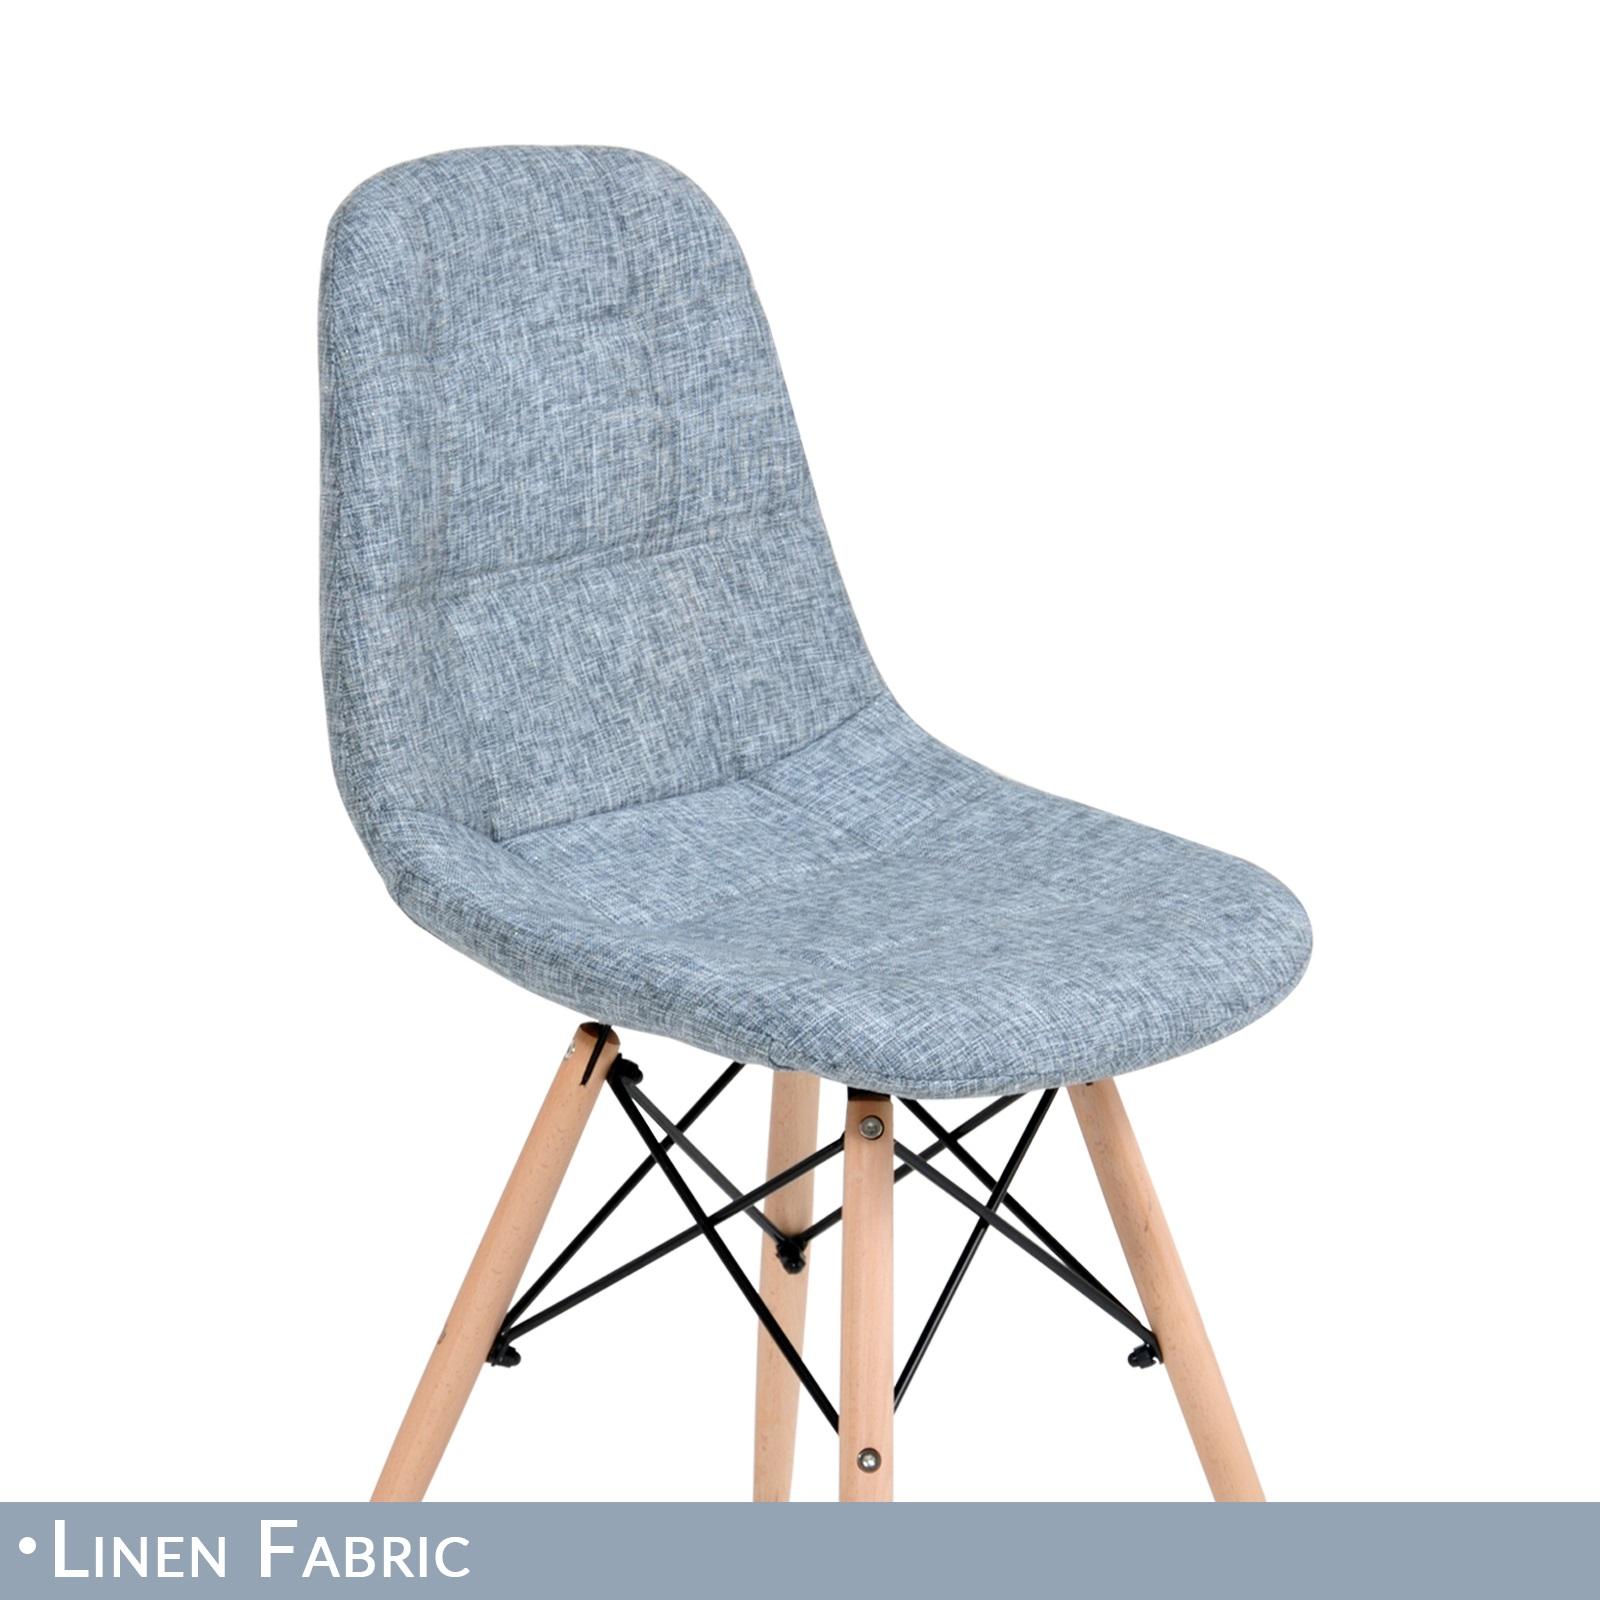 12 x Replica Eames Ellen Linen Fabric Dining Chair Grey  : Eames Ellen Grey 04 from www.ebay.com.au size 1600 x 1600 jpeg 600kB